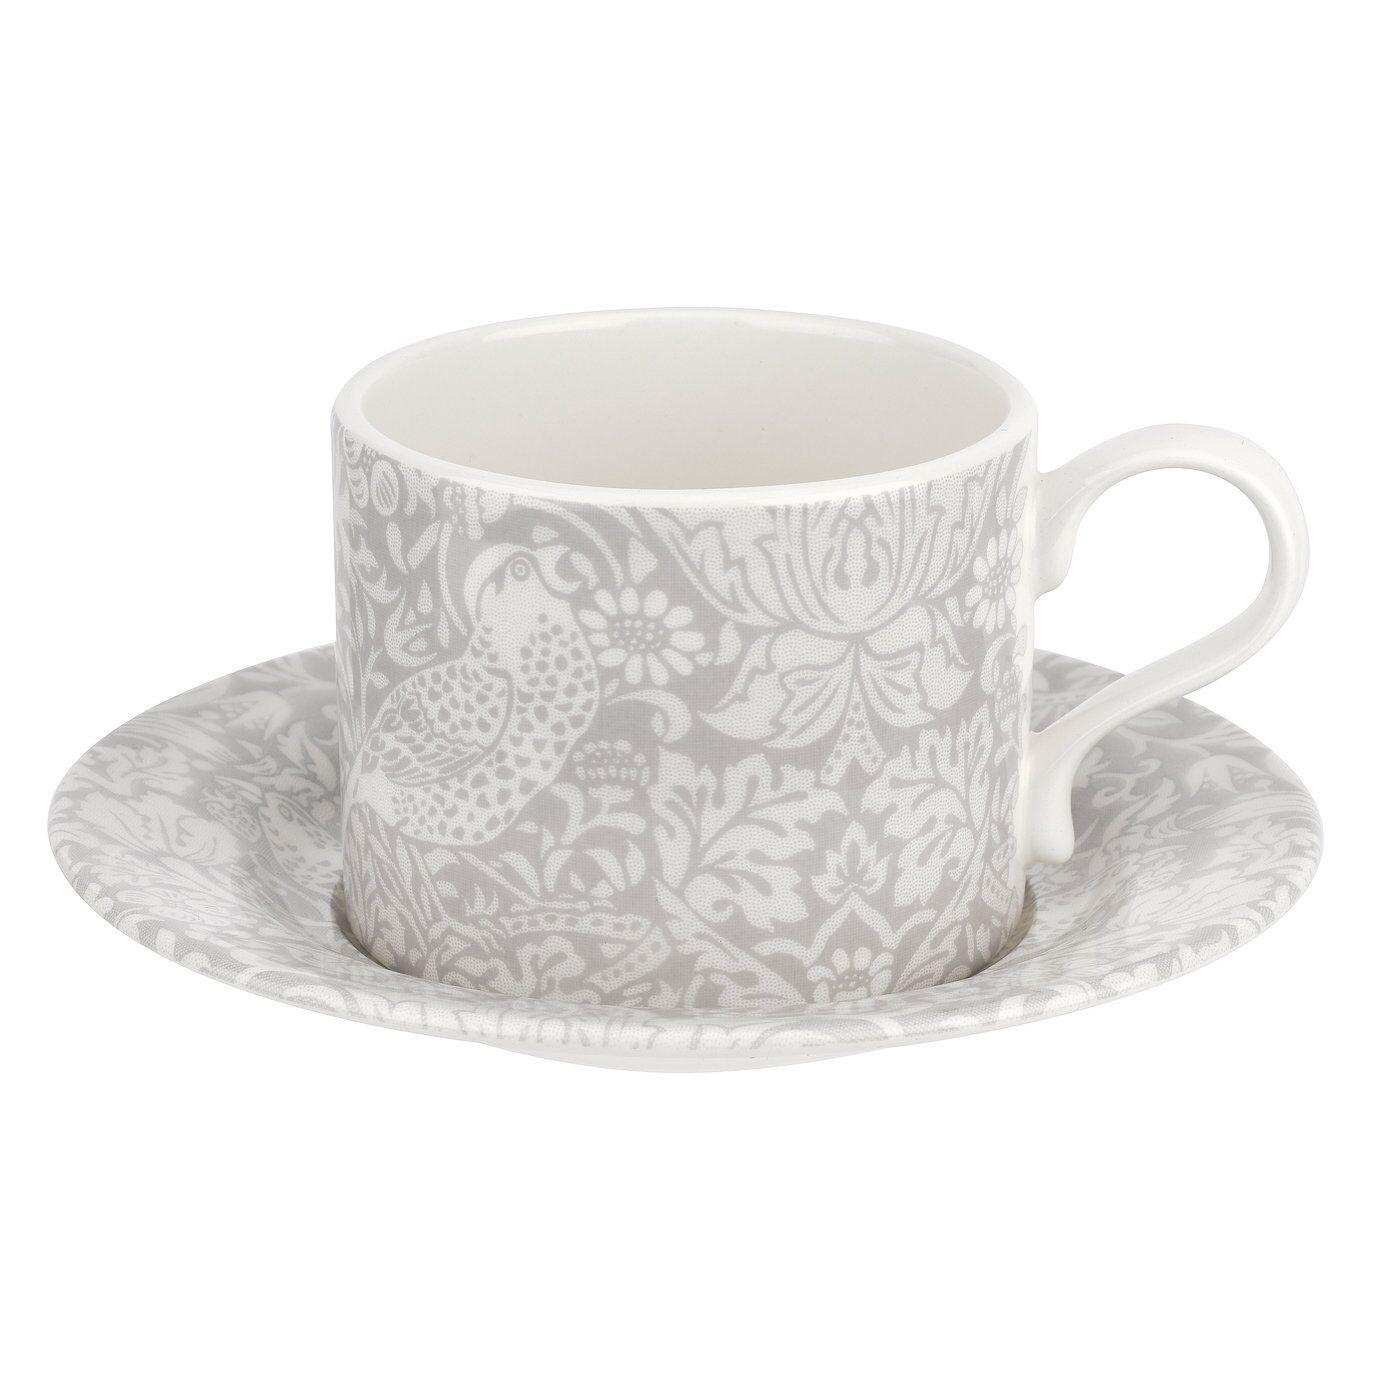 Spode Morris Strawberry Thief Tea Cup and Saucer, 28 cl